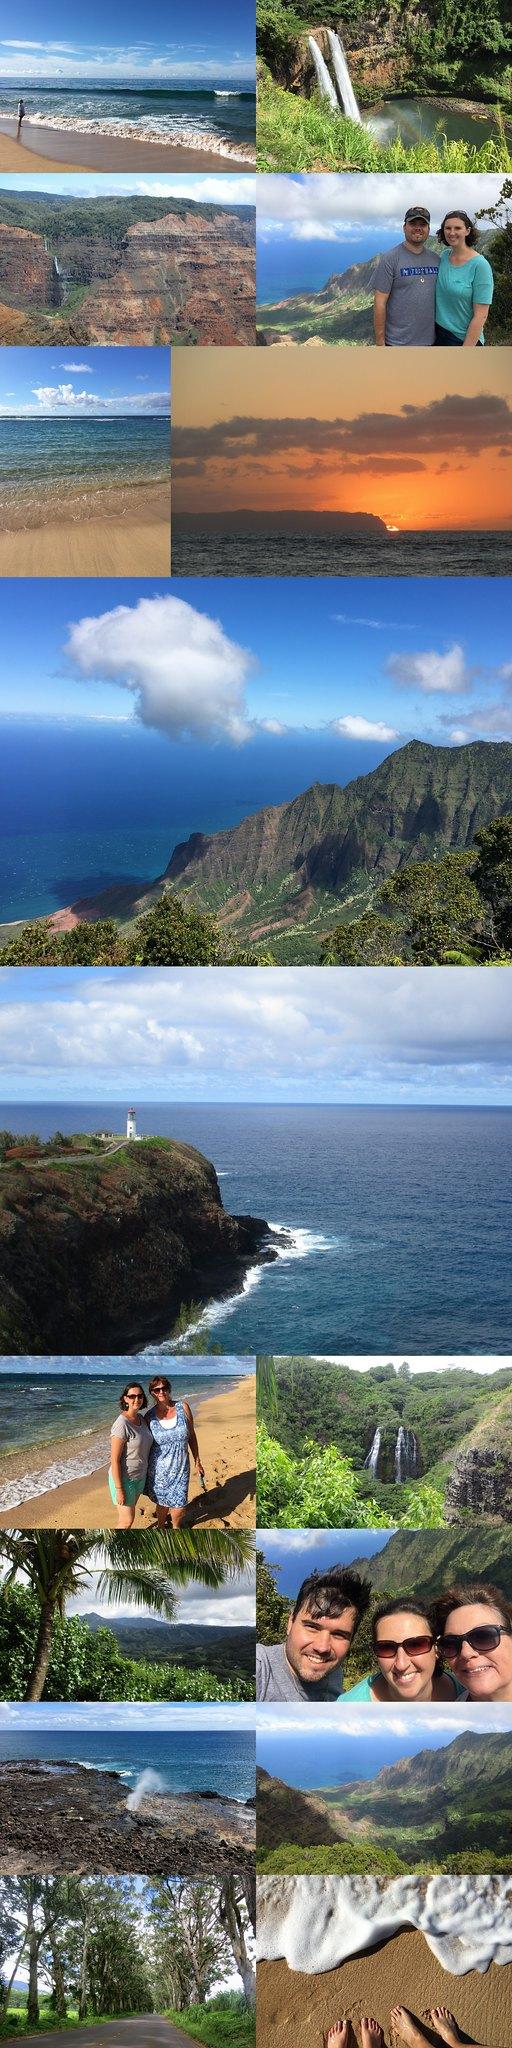 kauai collage 2